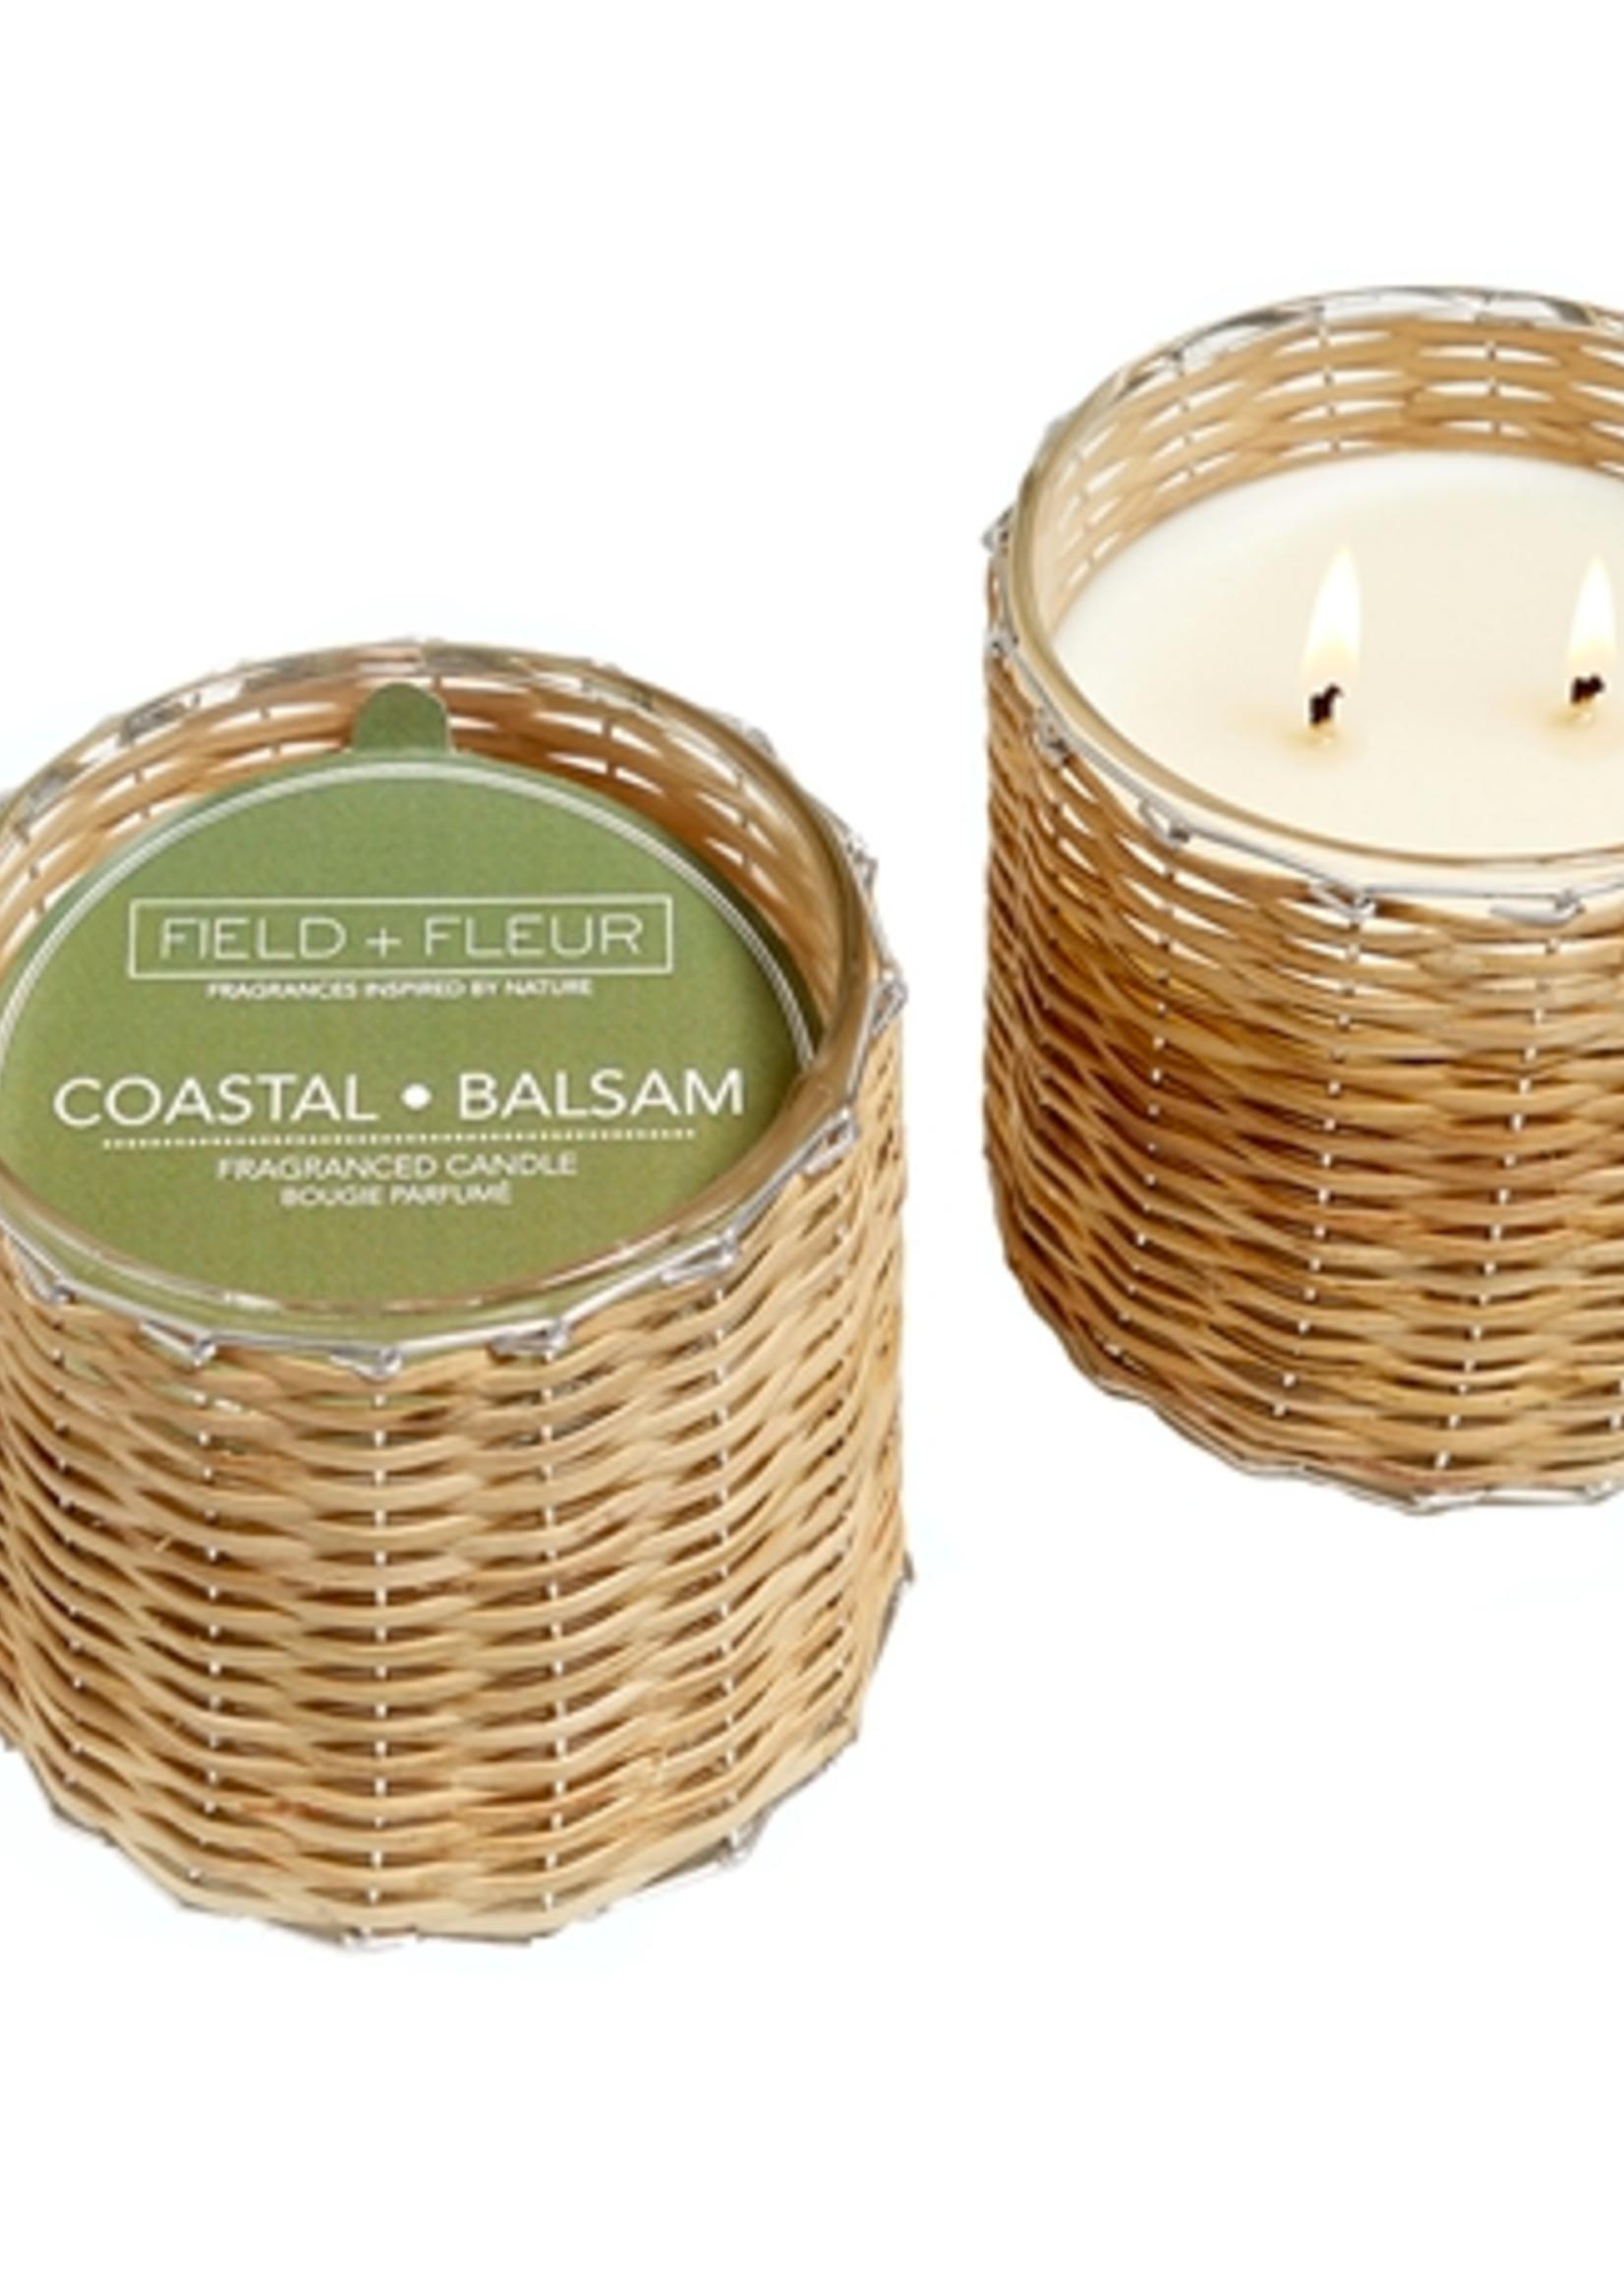 Hillhouse Naturals Coastal Balsam 2 Wick Handwoven Candle